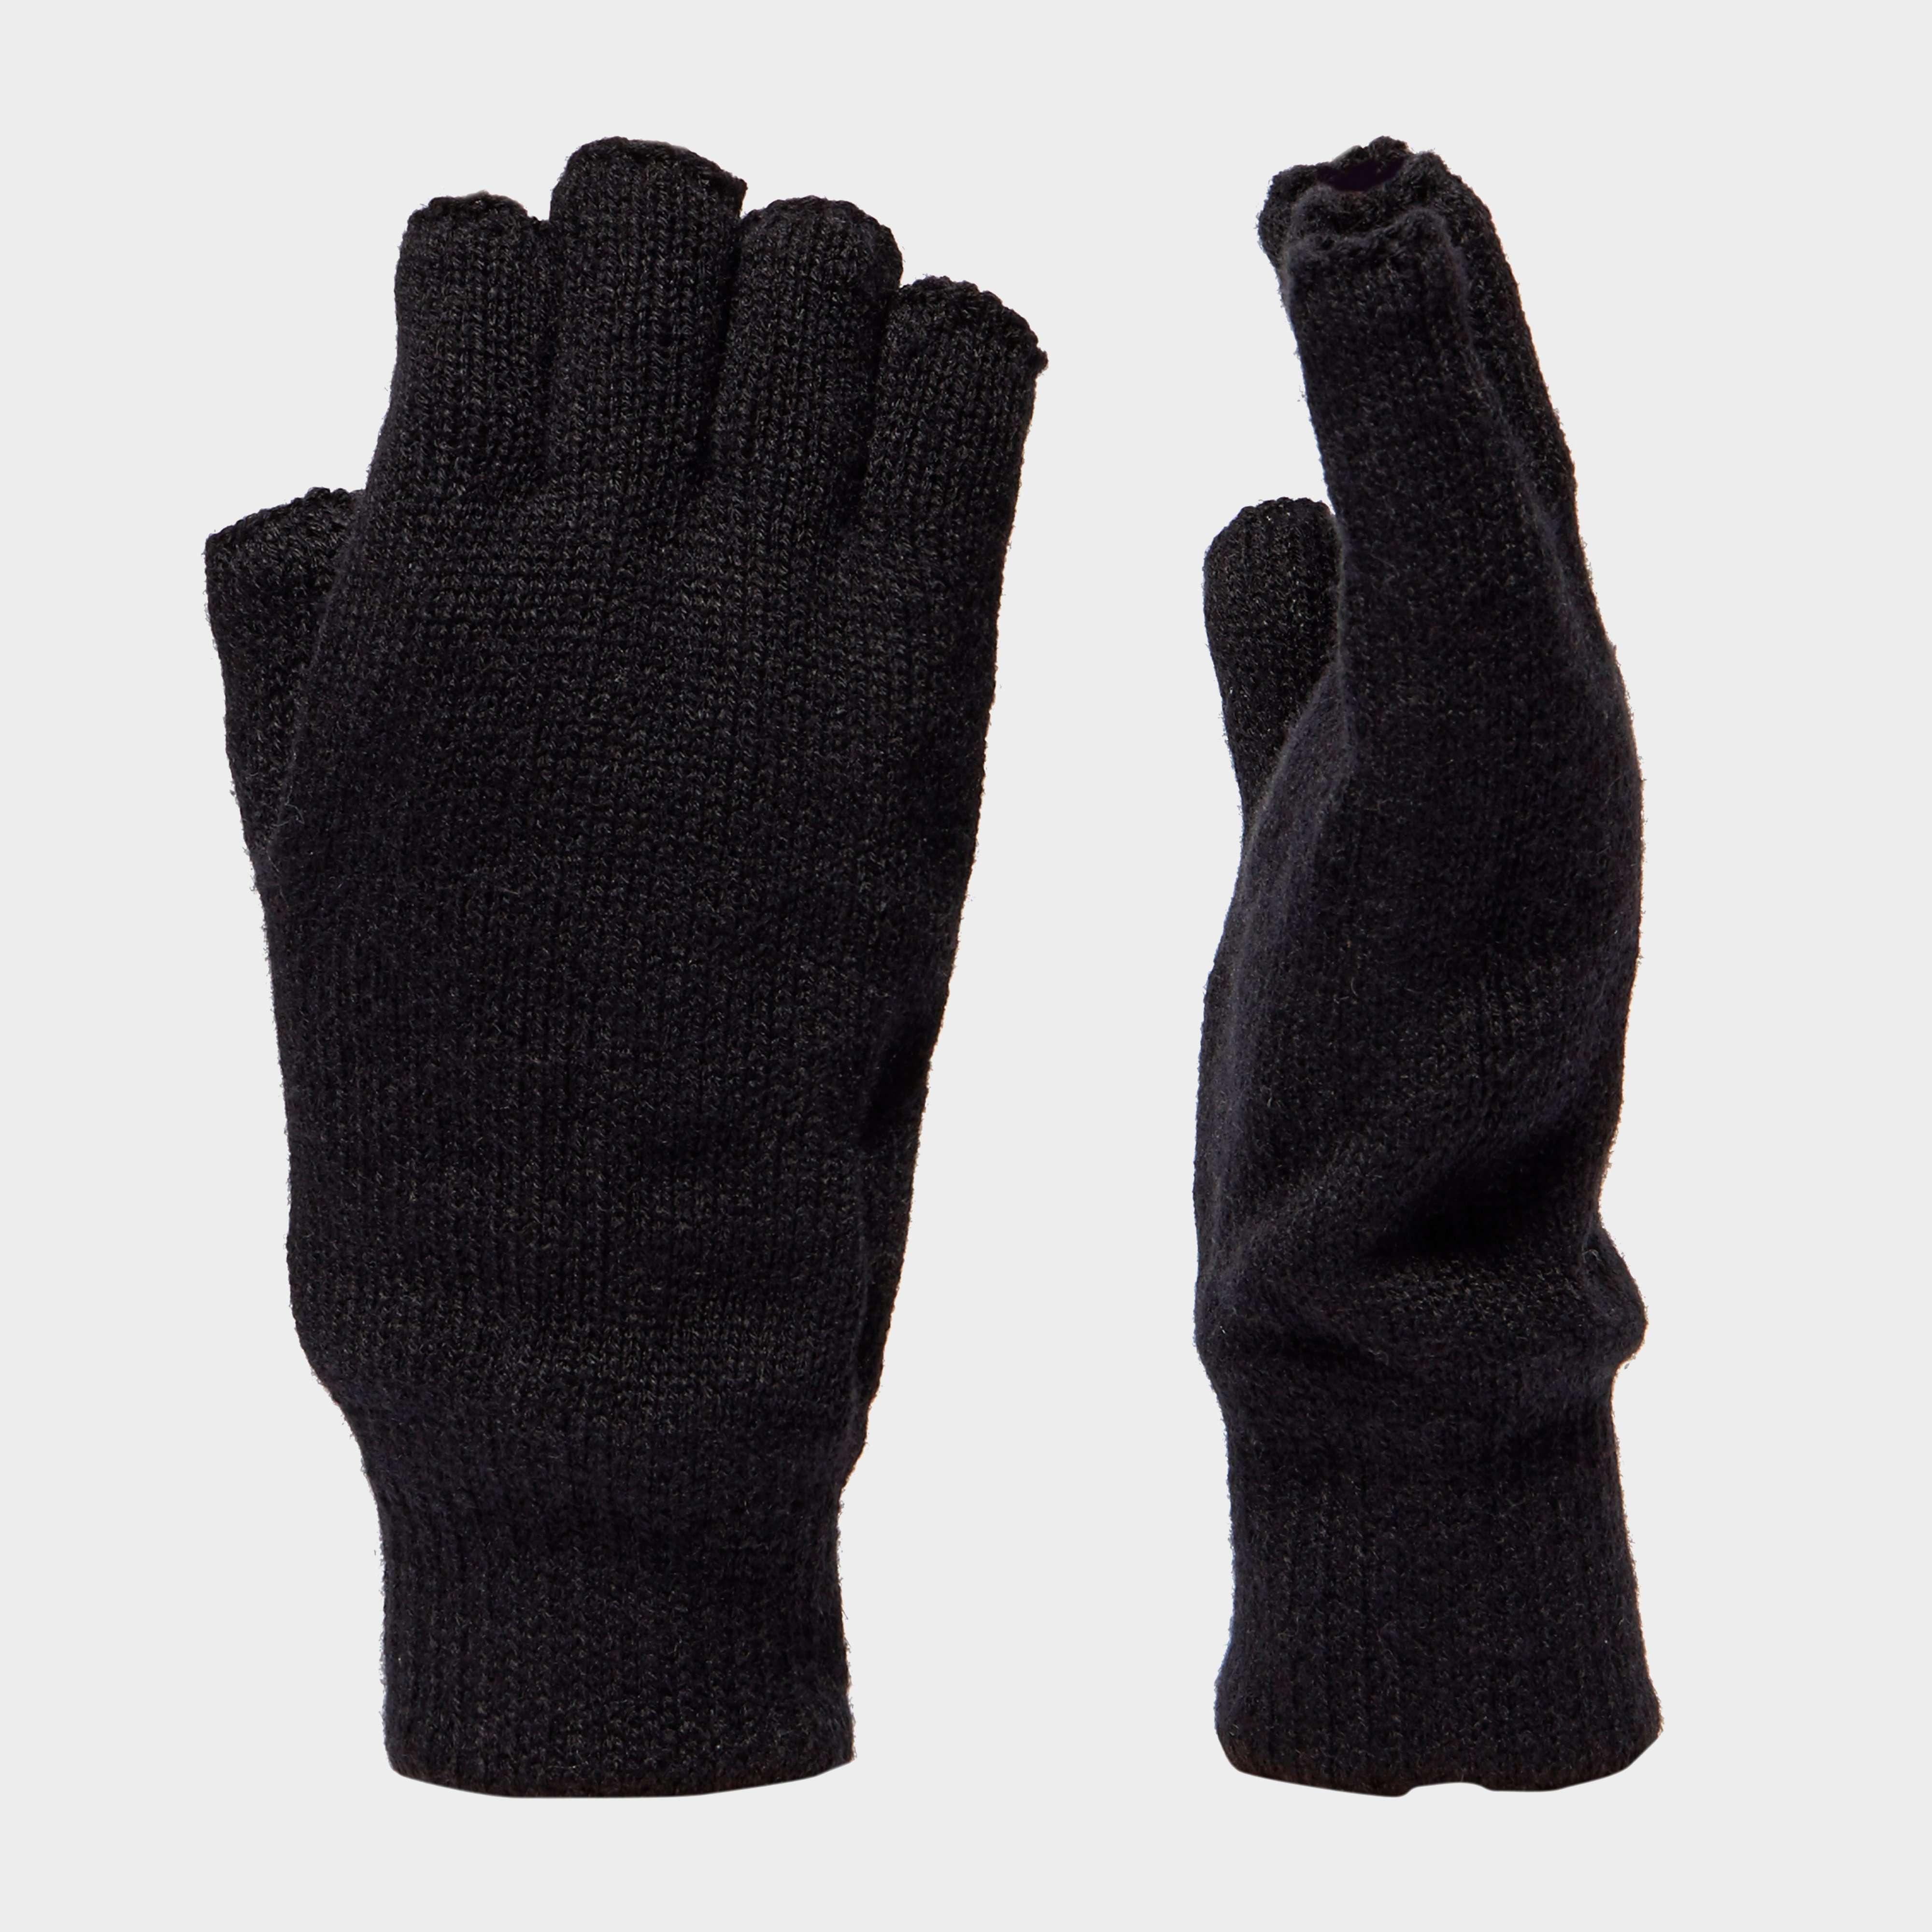 PETER STORM Women's Thinsulate Fingerless Gloves